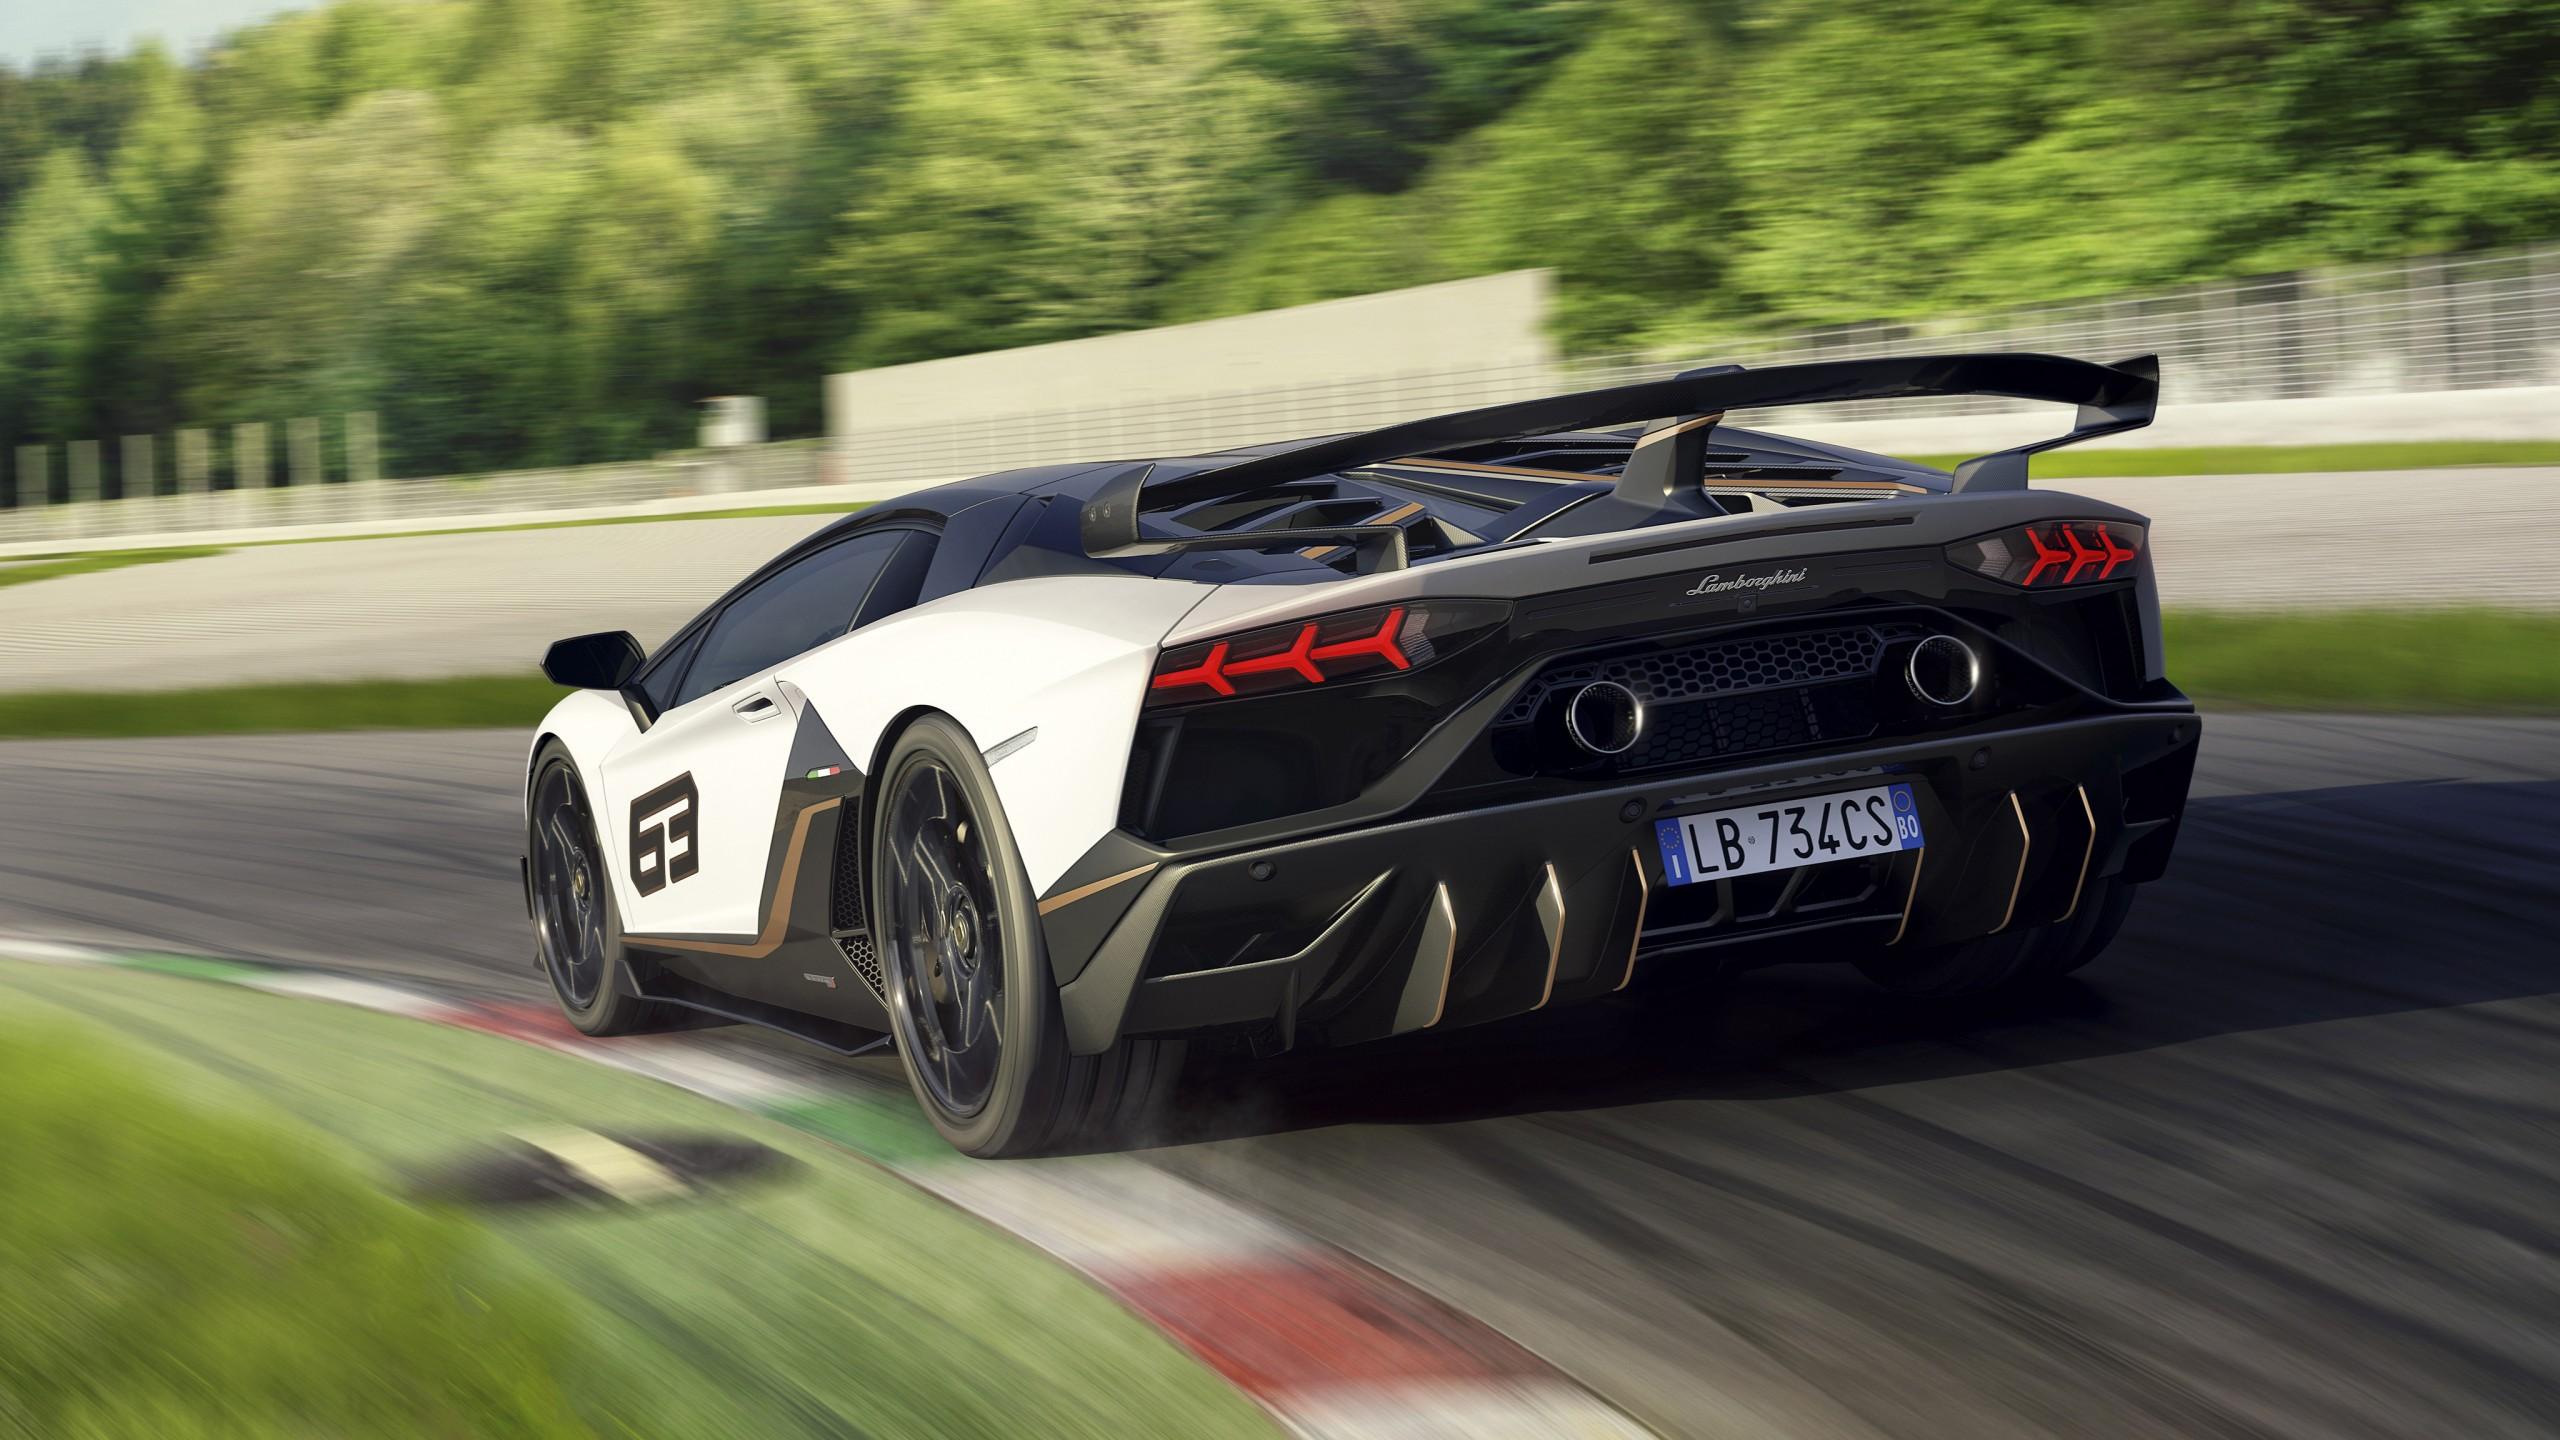 Lamborghini Aventador Svj 63 2019 4k 8 Wallpaper Hd Car